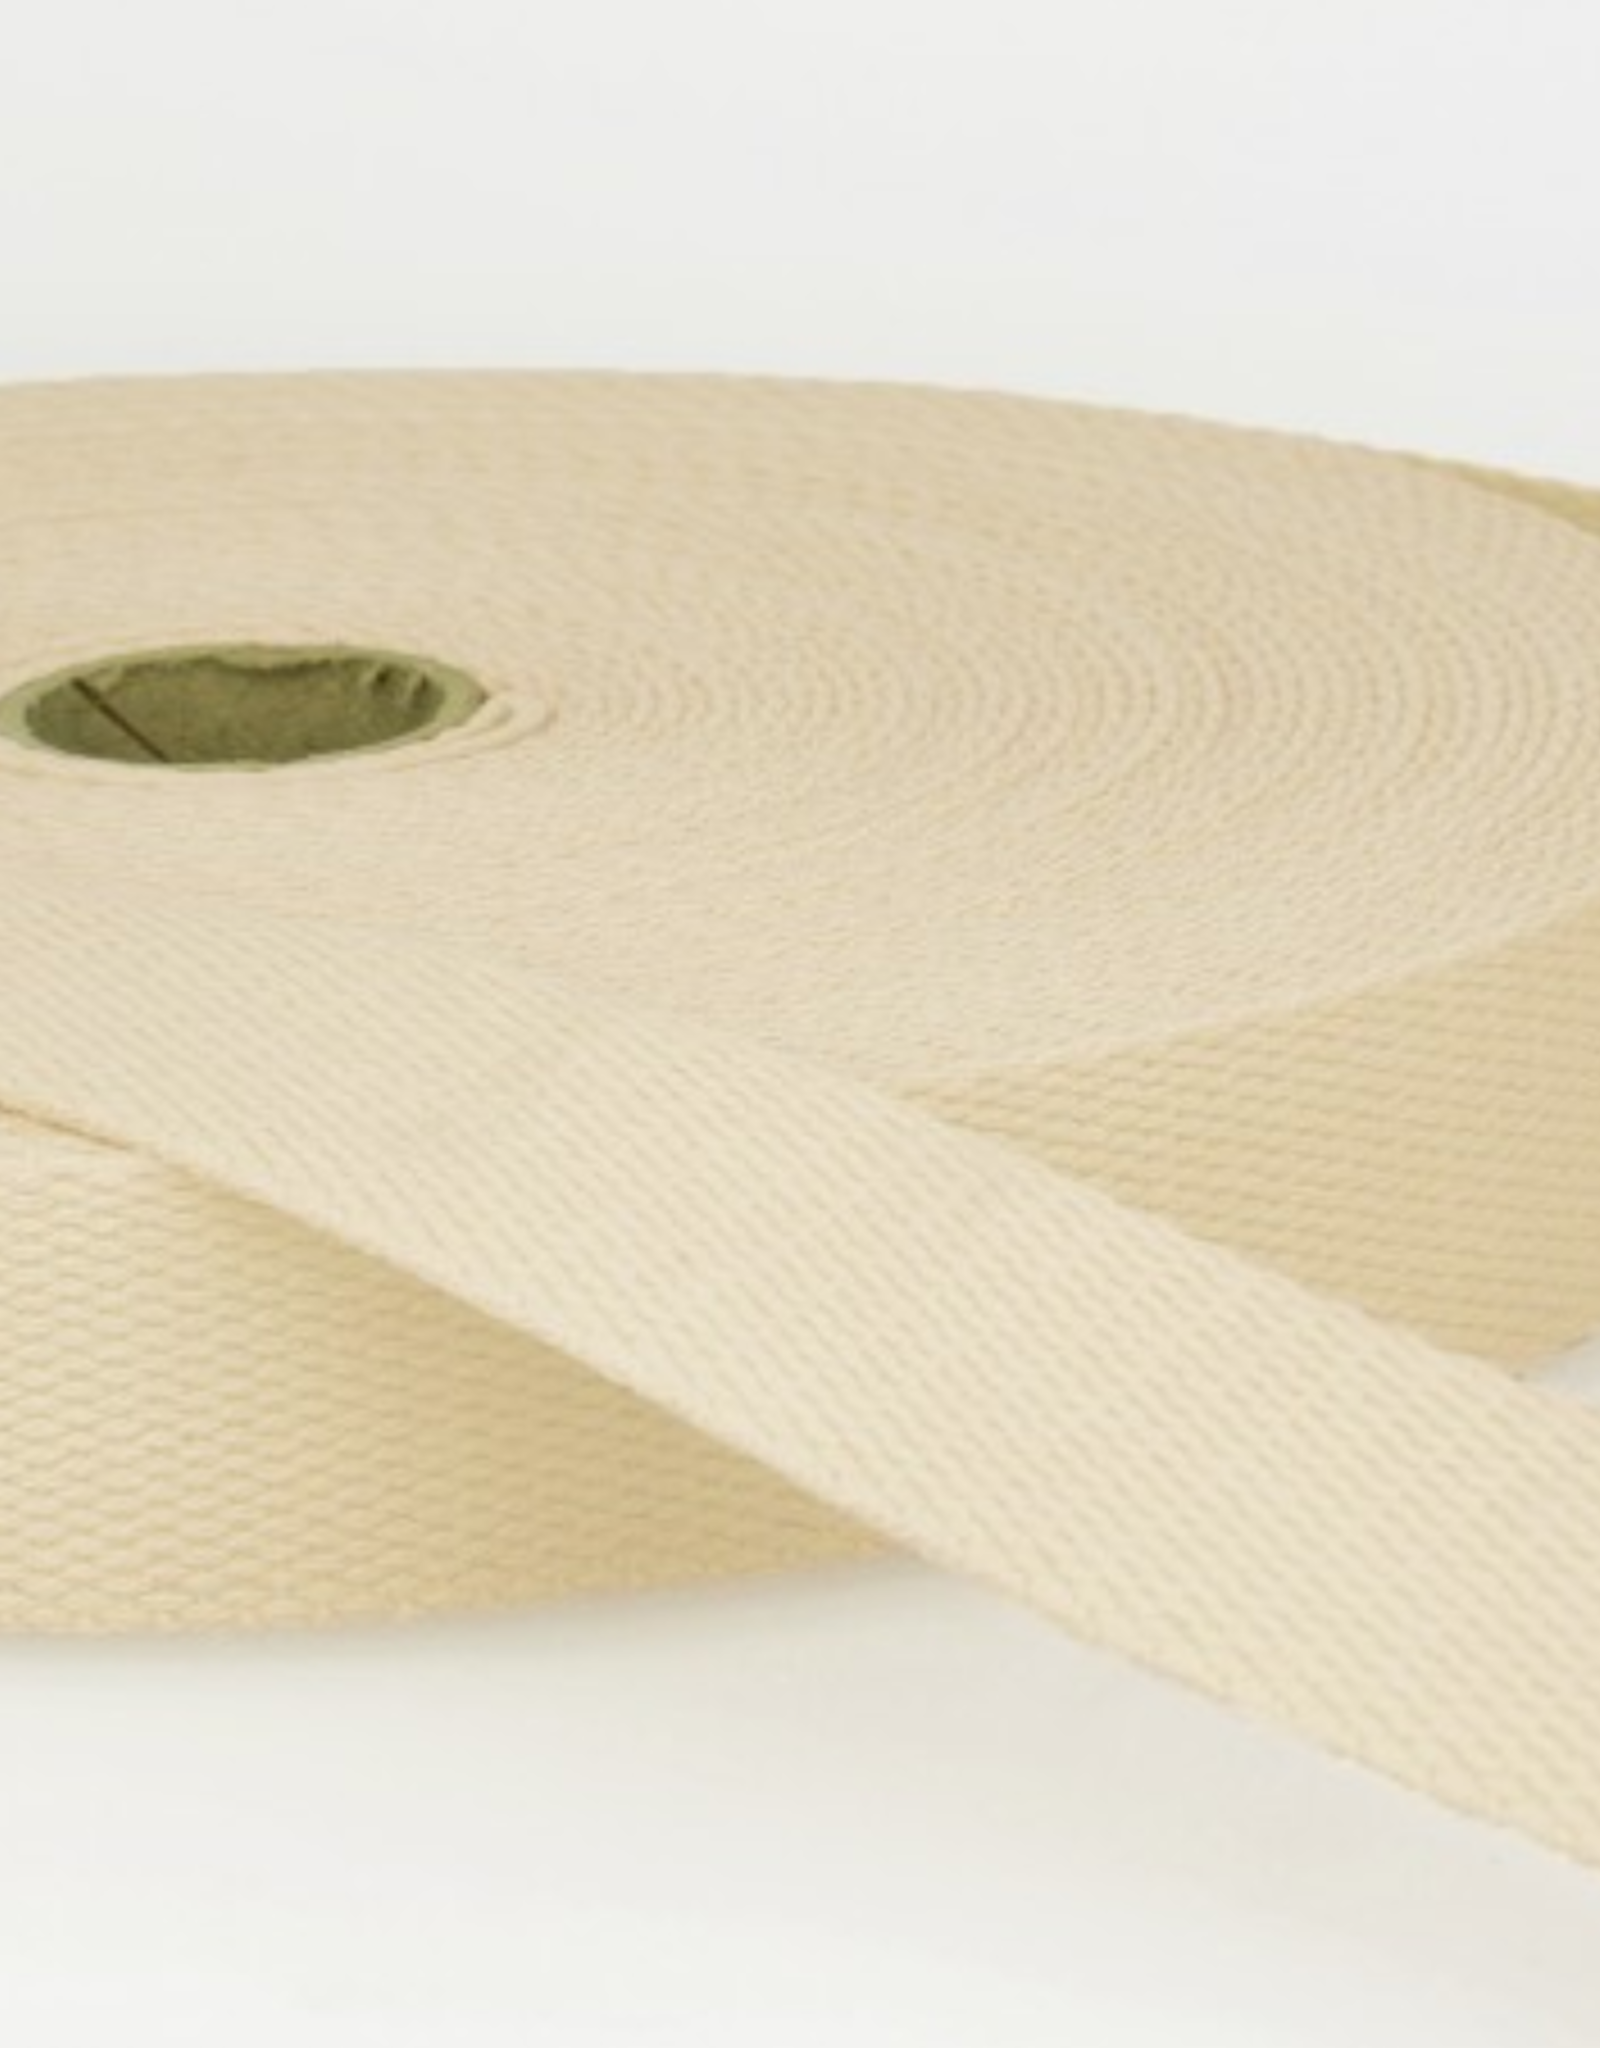 Tassenband - Ecru - 25mm